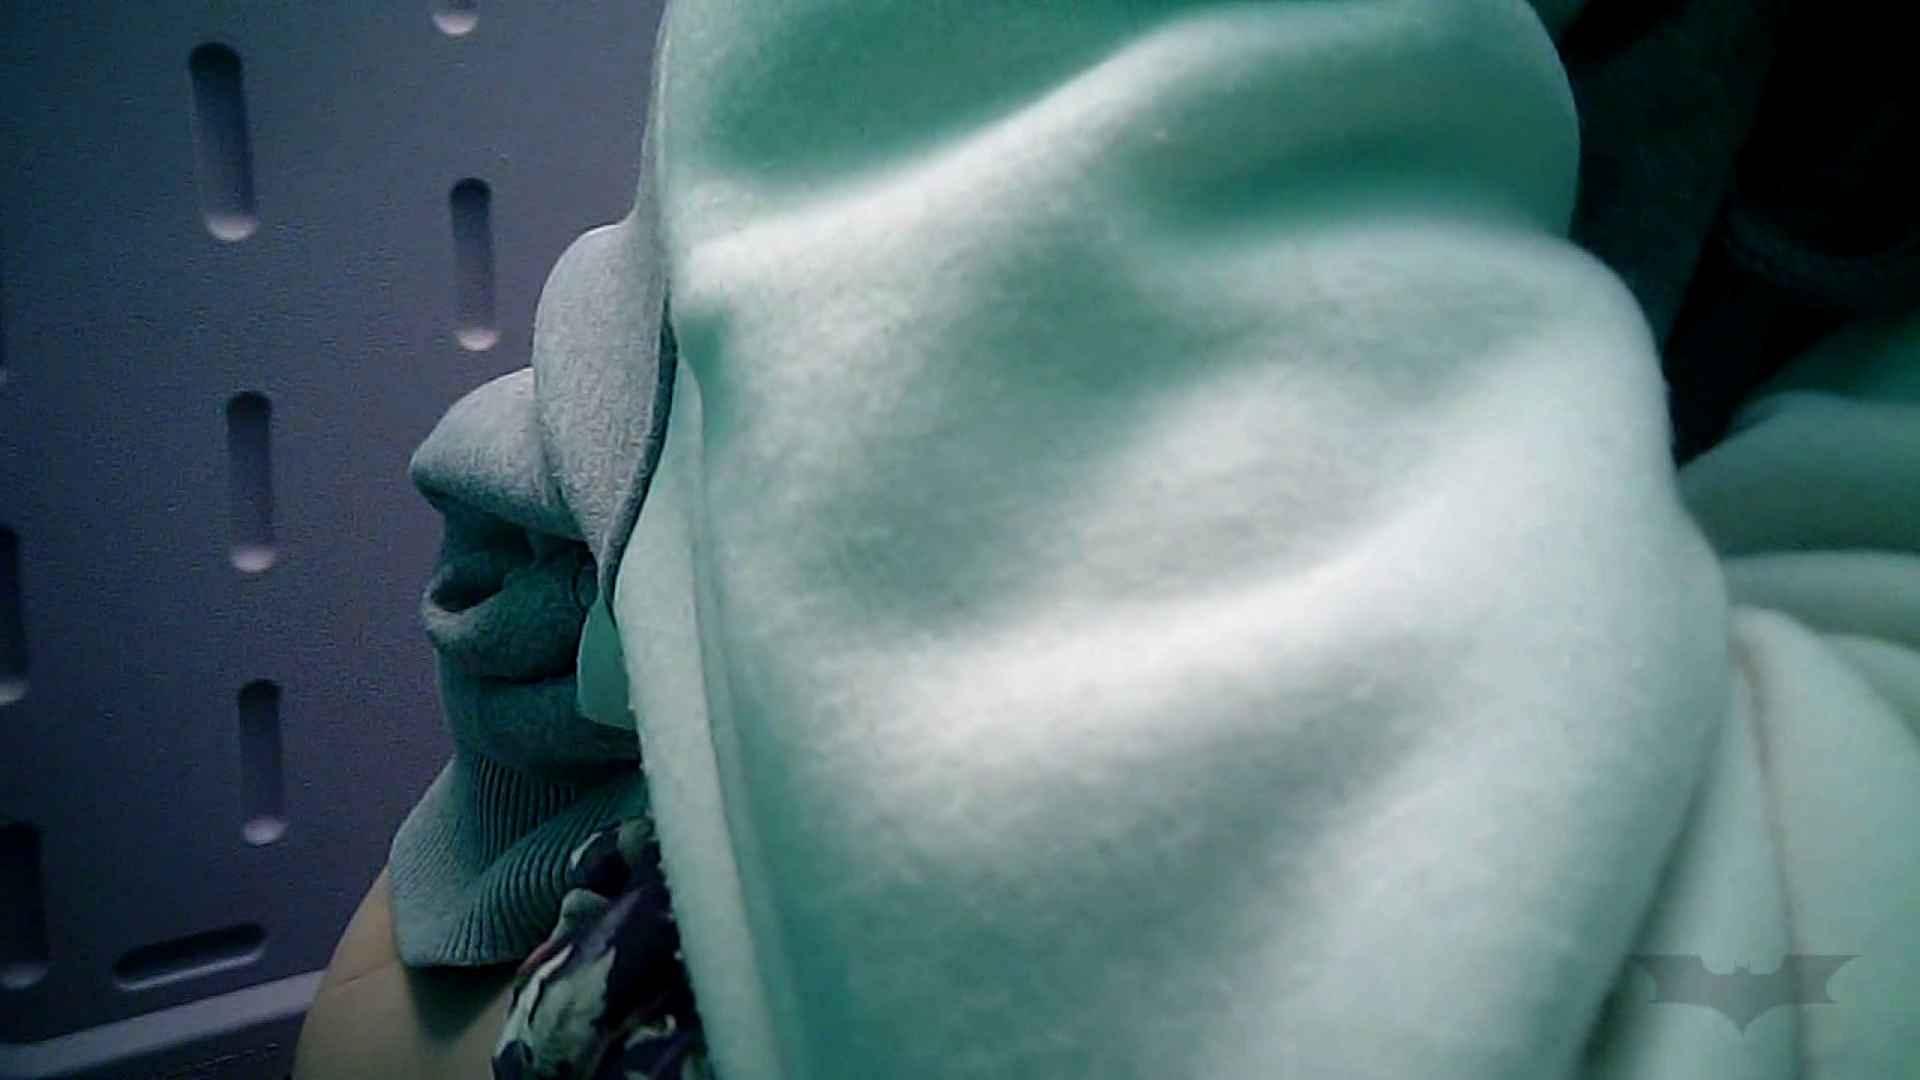 痴態洗面所 Vol.09 美女系、清楚系、ギャル系、時々祭り系?? 洗面所  66pic 46